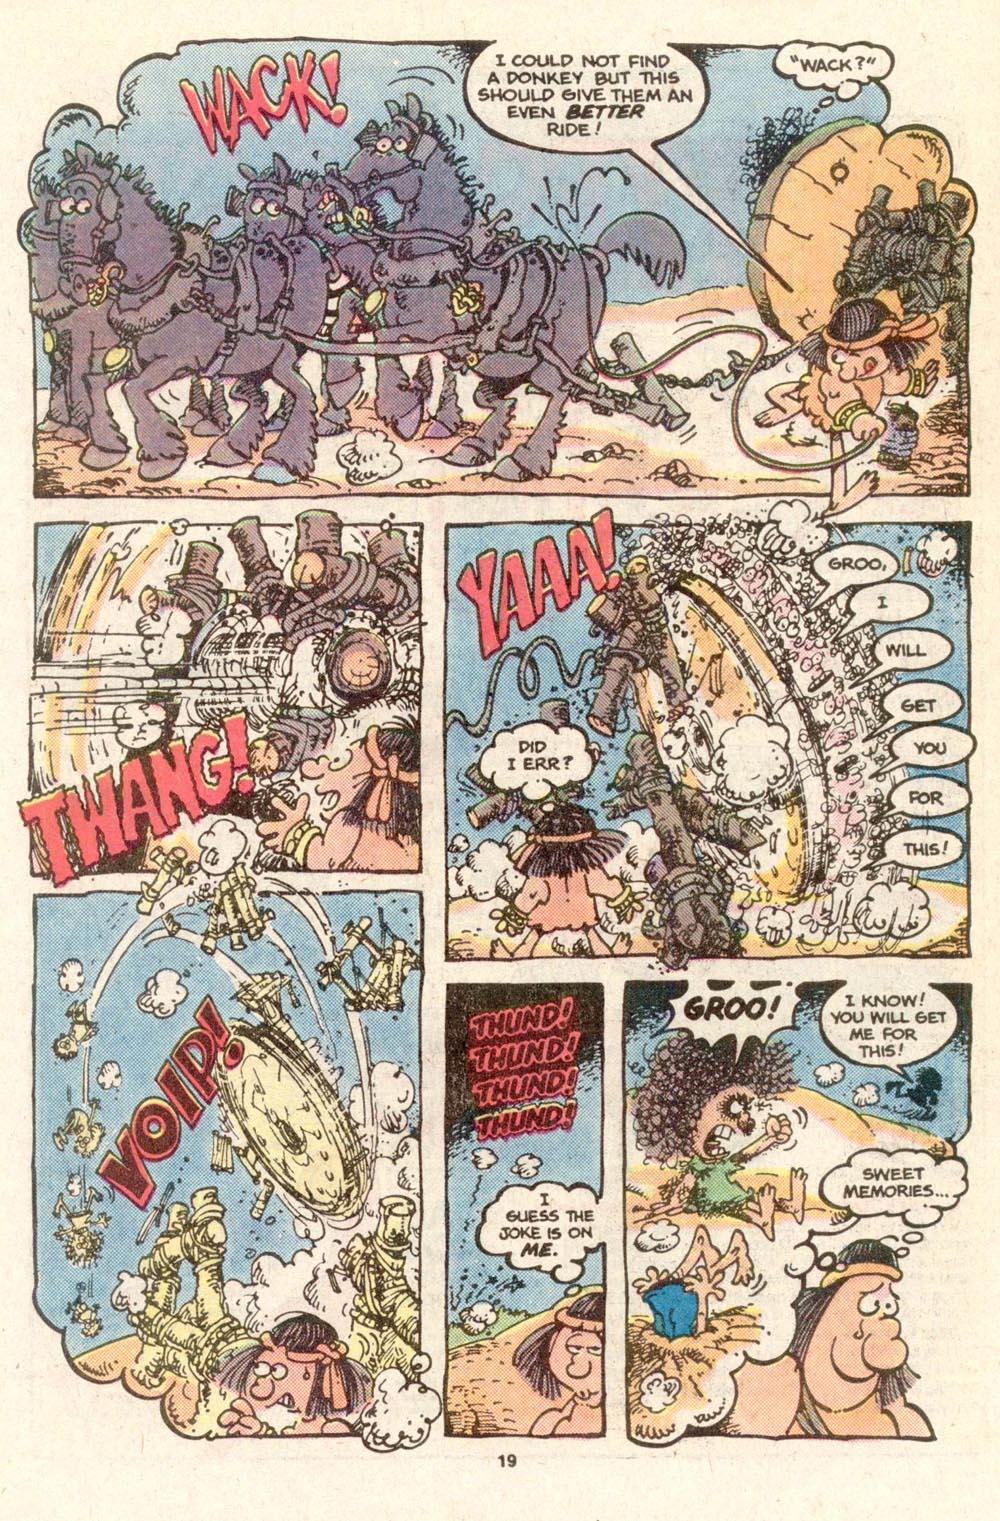 Read online Sergio Aragonés Groo the Wanderer comic -  Issue #19 - 19